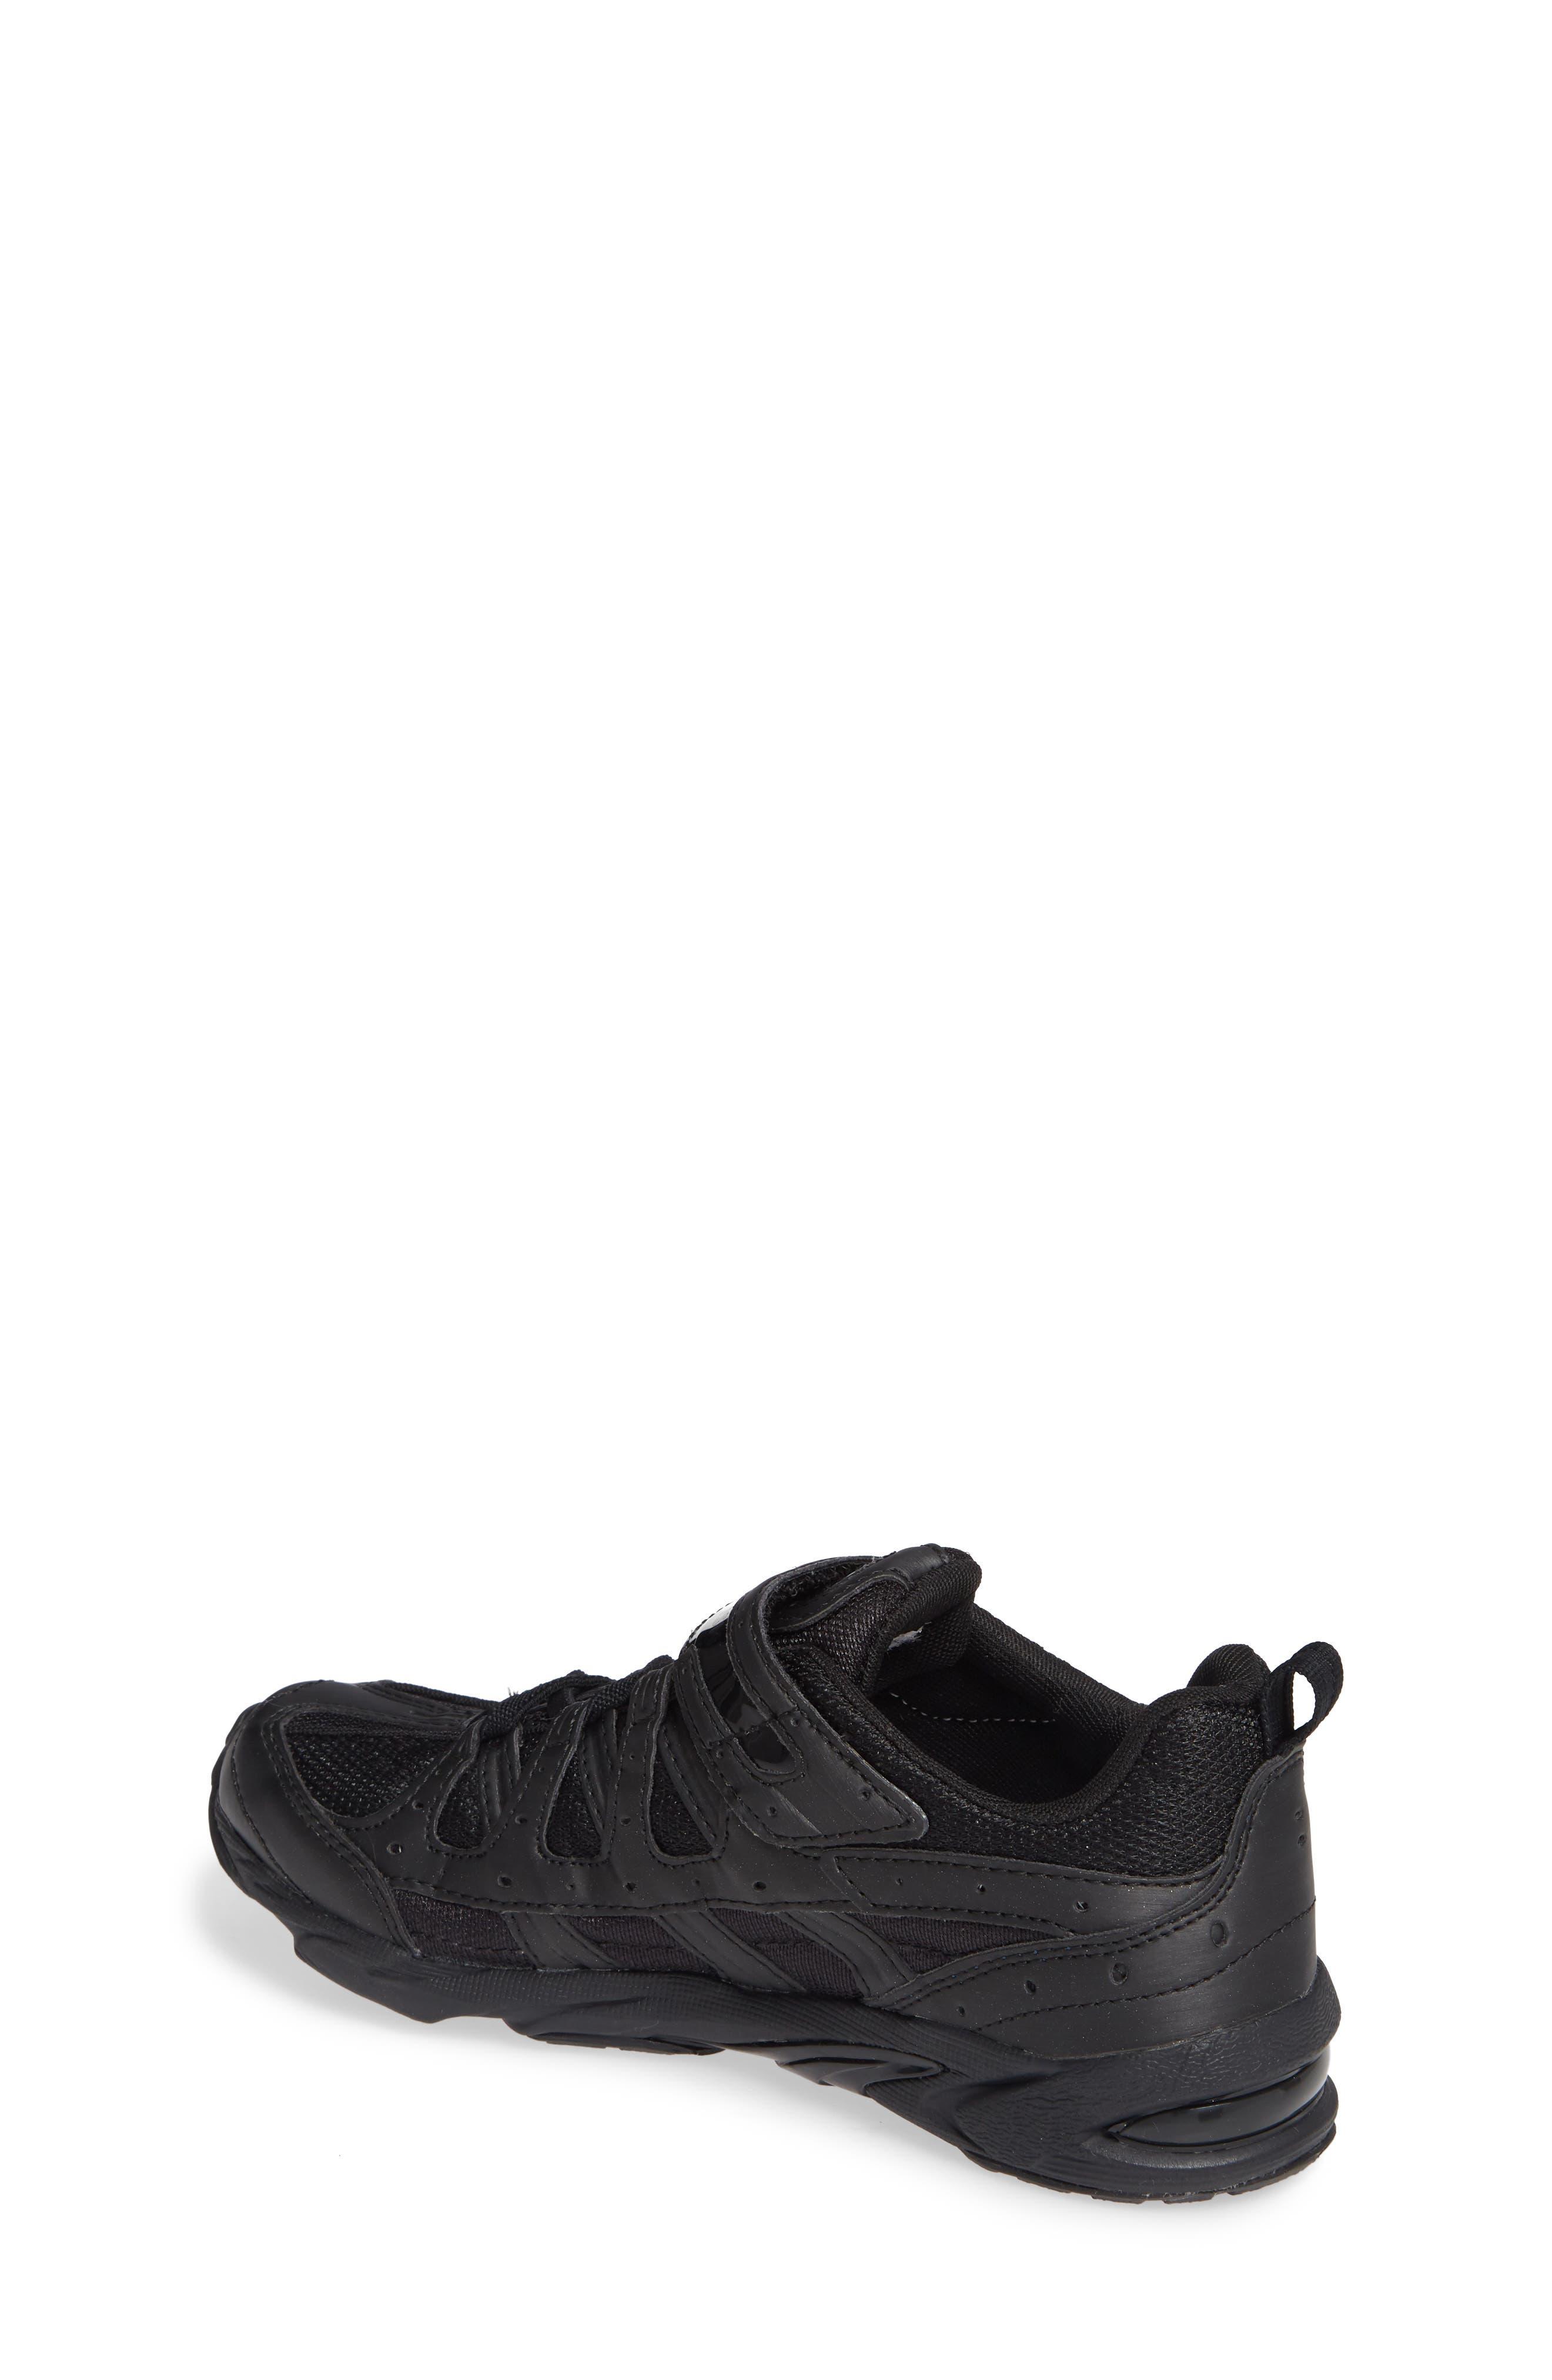 TSUKIHOSHI, Speed Washable Sneaker, Alternate thumbnail 2, color, BLACK/ NOIR